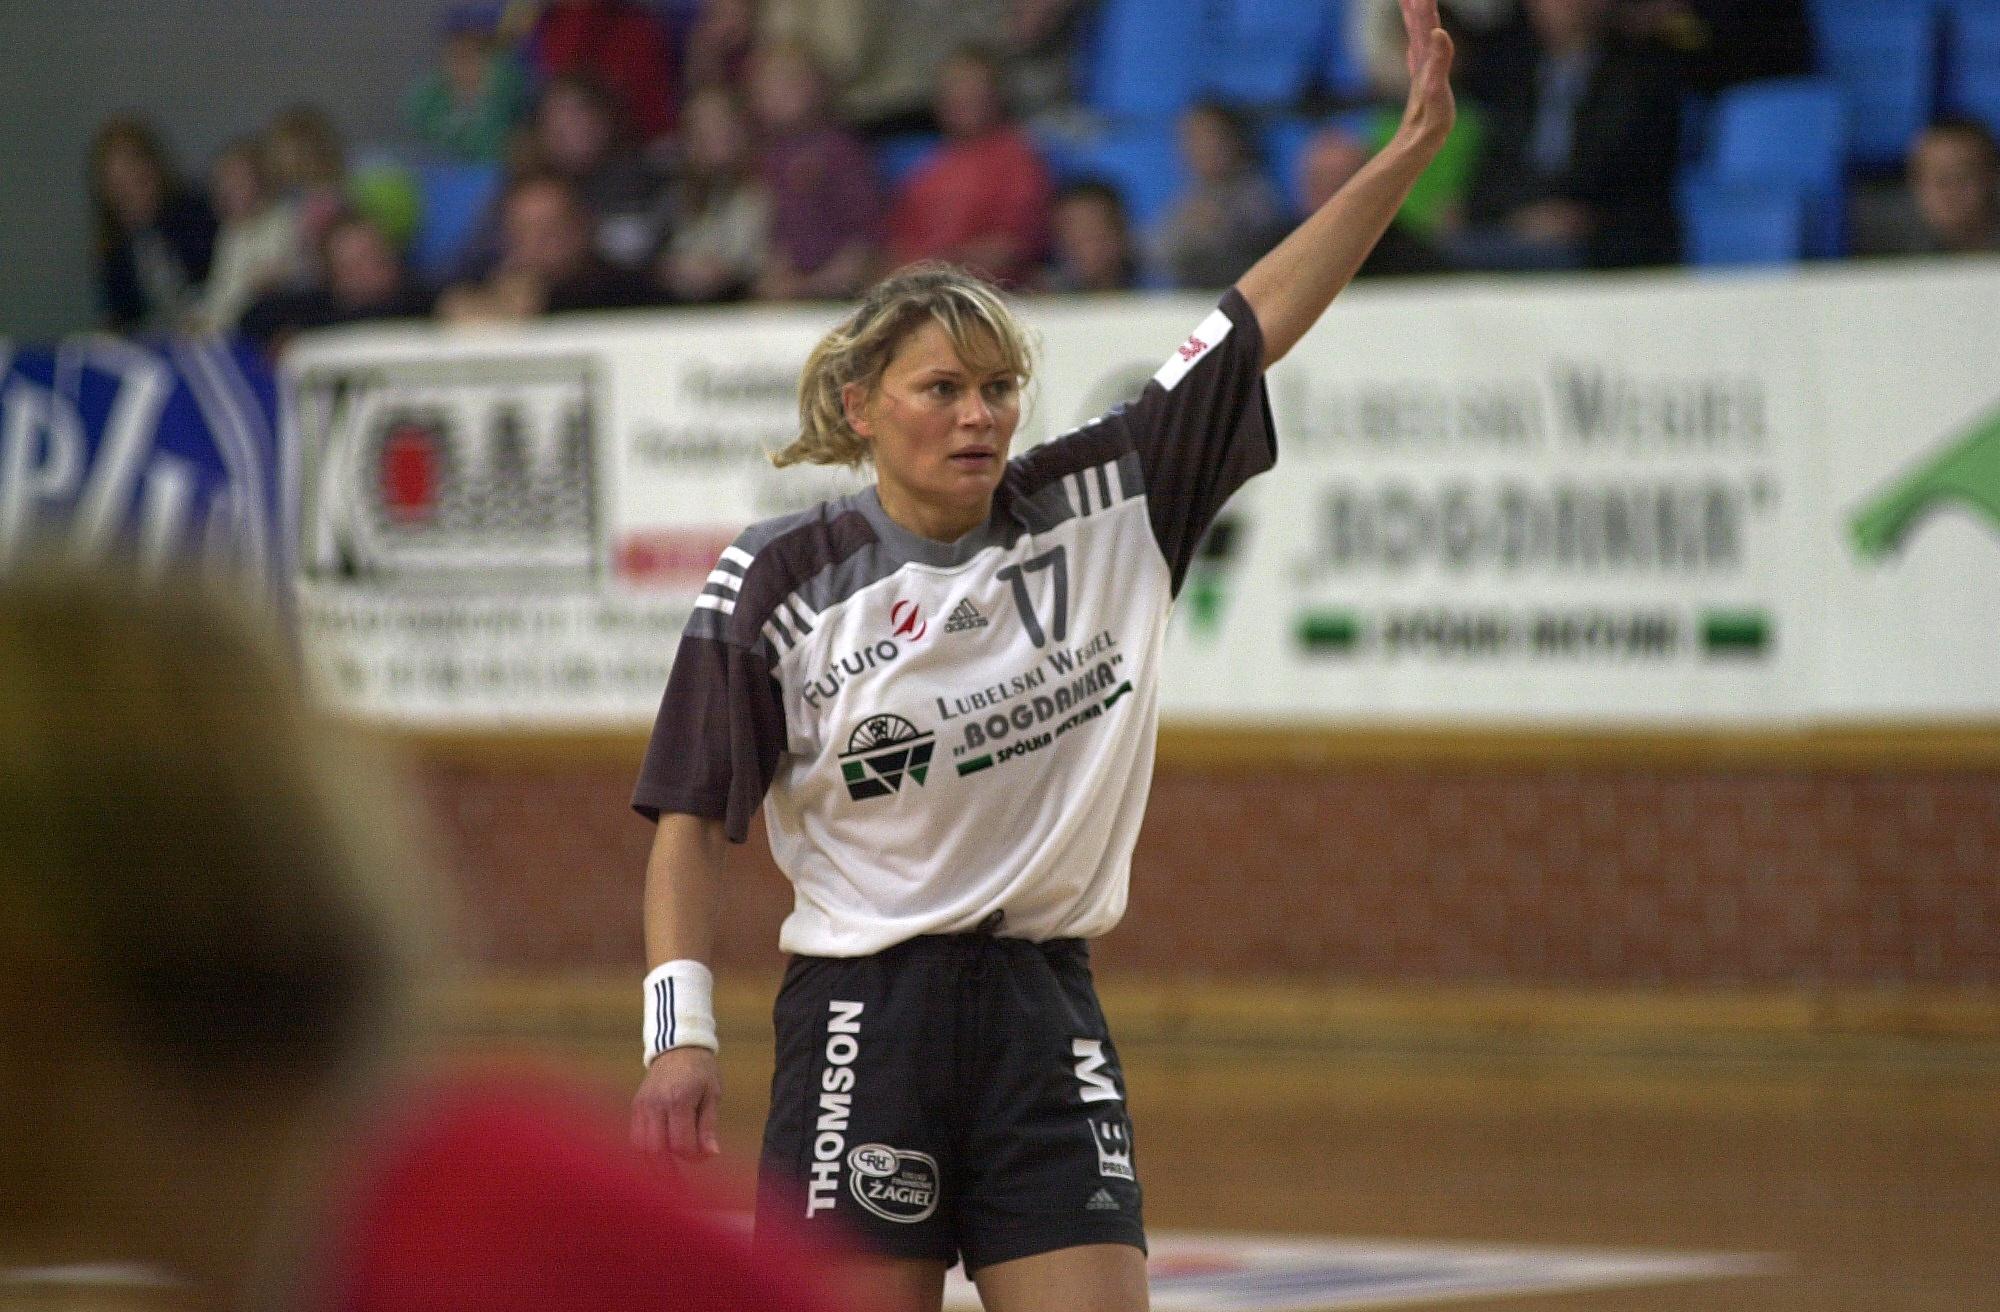 Rozmowa Wiolettą Luberecką - Hammershaug